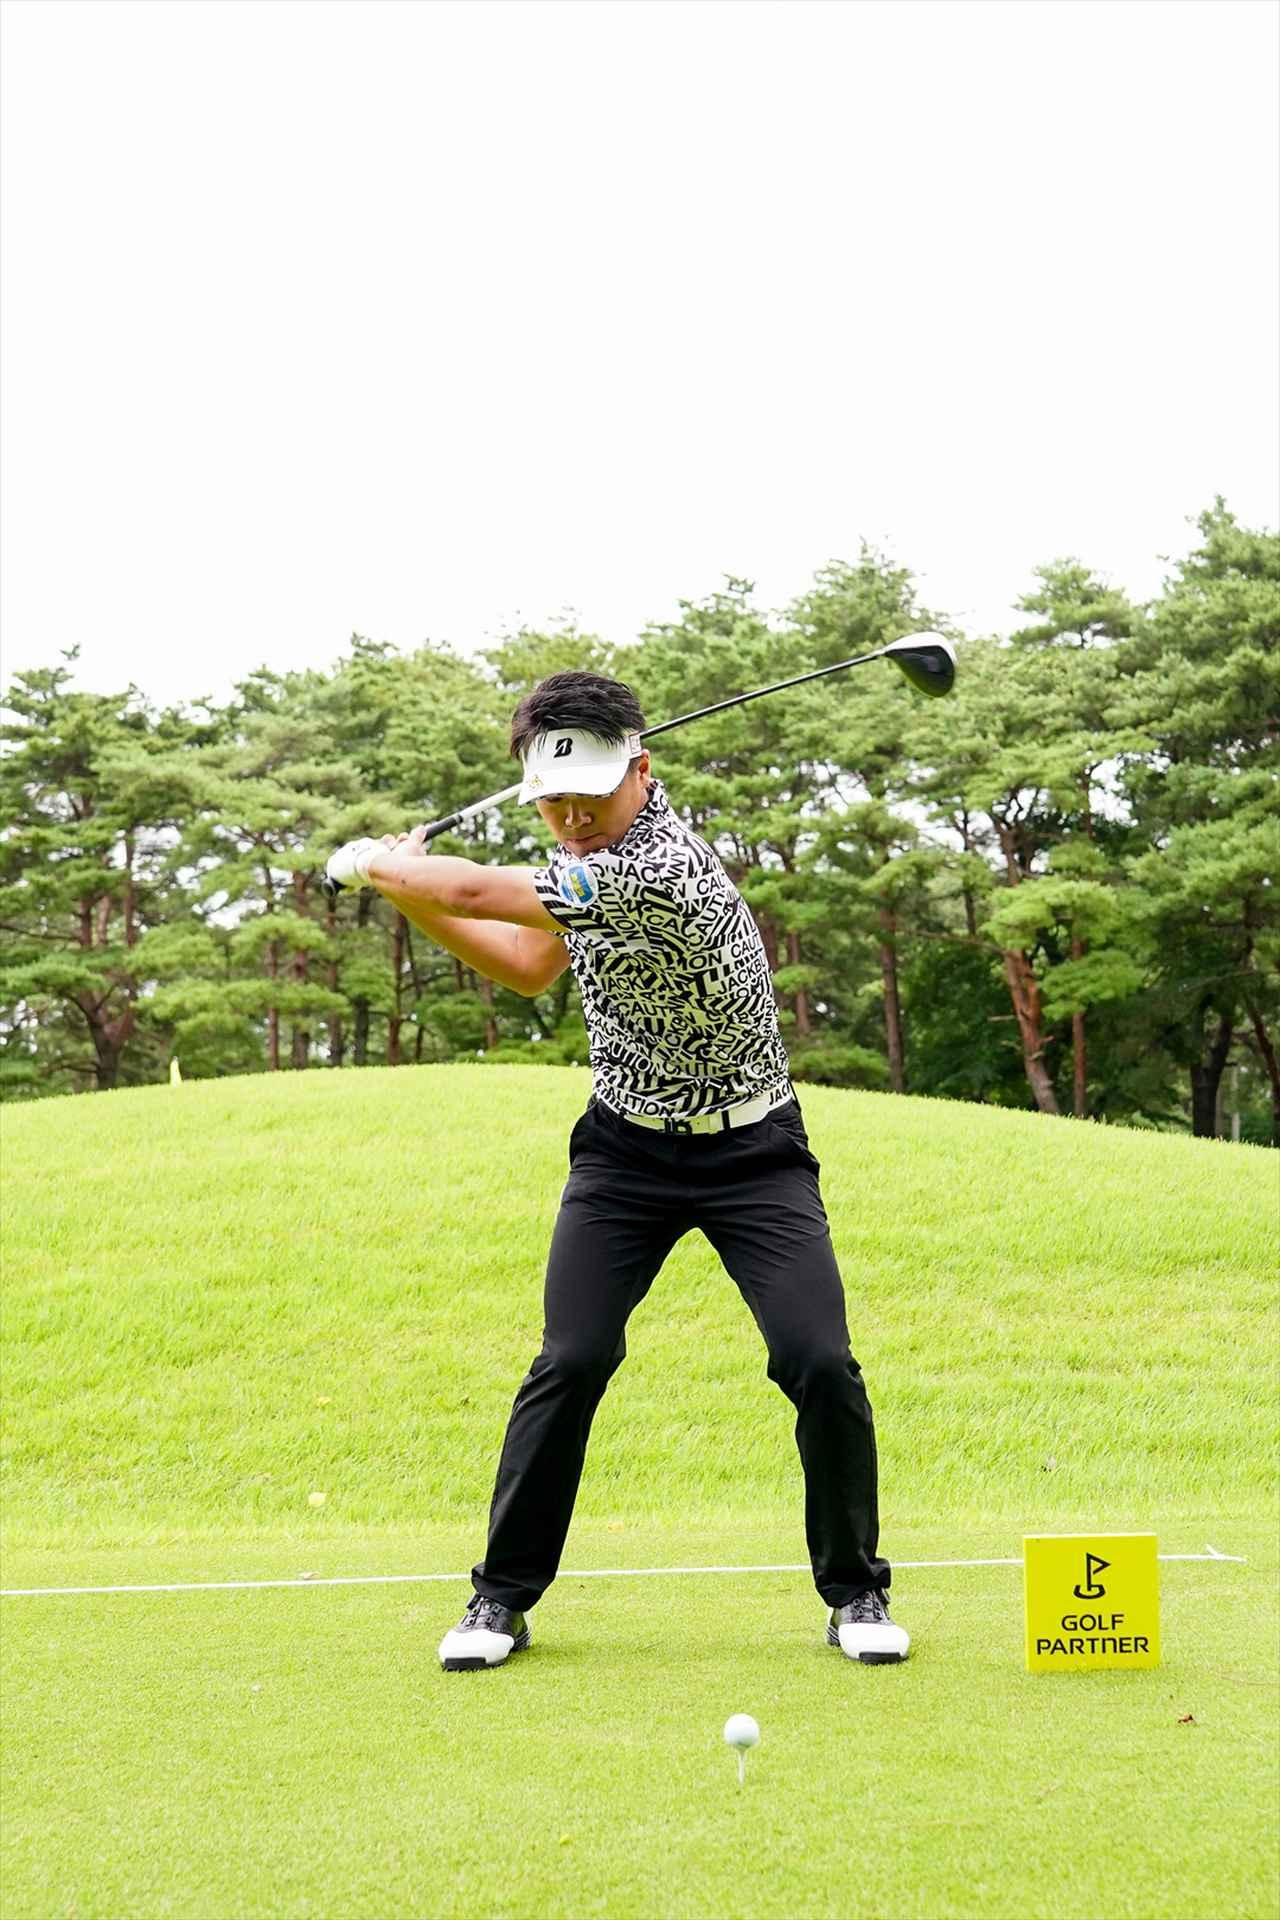 Images : 5番目の画像 - 関藤直煕 ドライバー正面連続写真 - みんなのゴルフダイジェスト